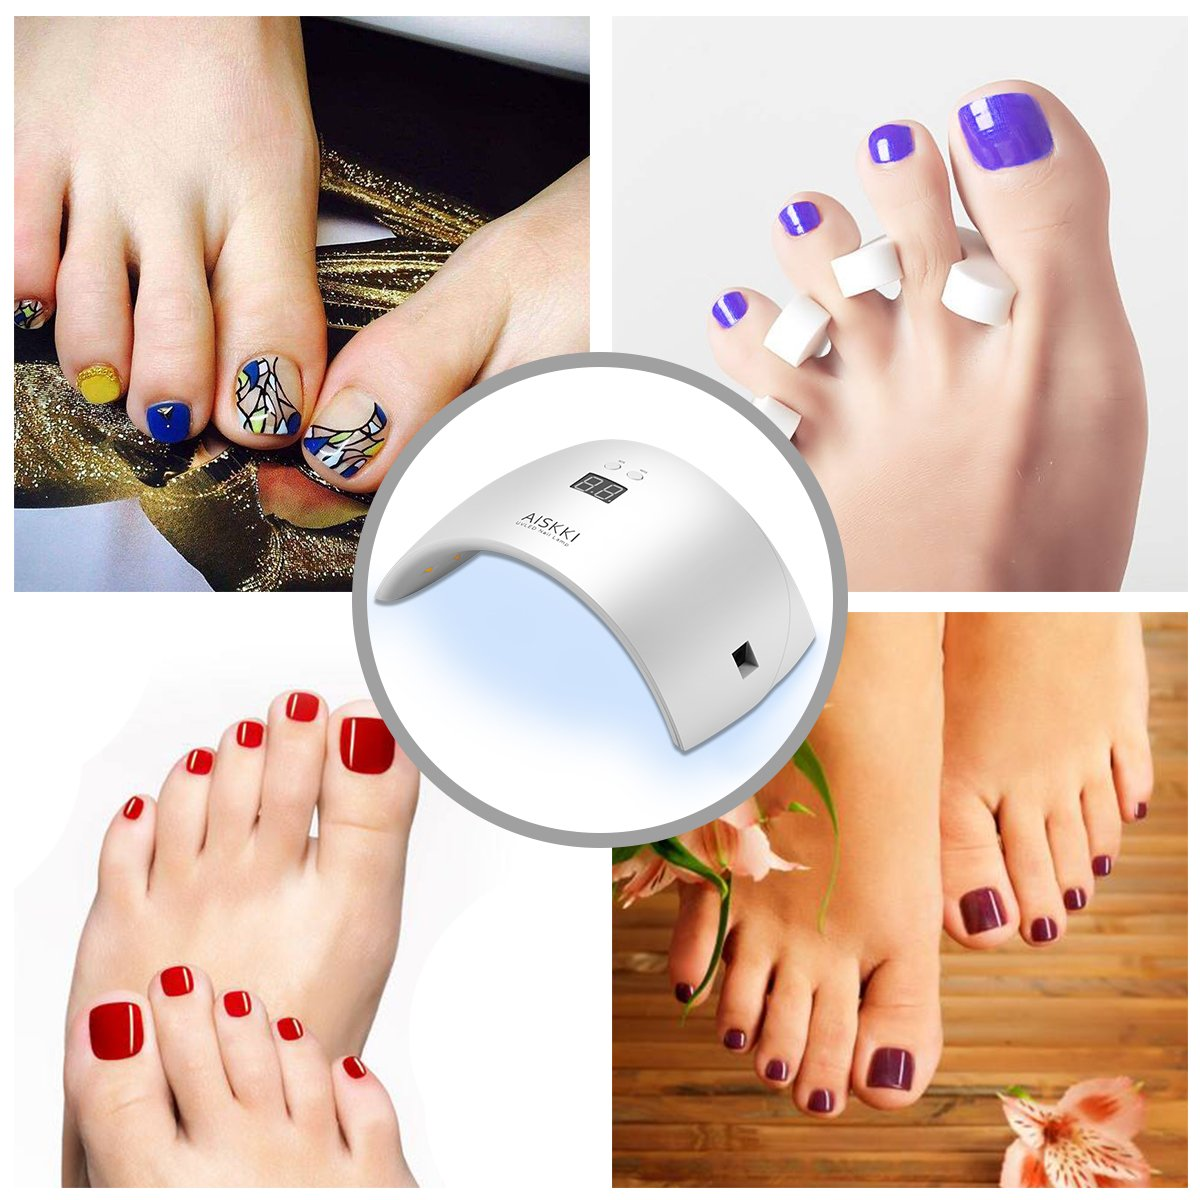 UV LED Nageltrockner, Aiskki LED UV Nagellampe für Hände und Füße ...